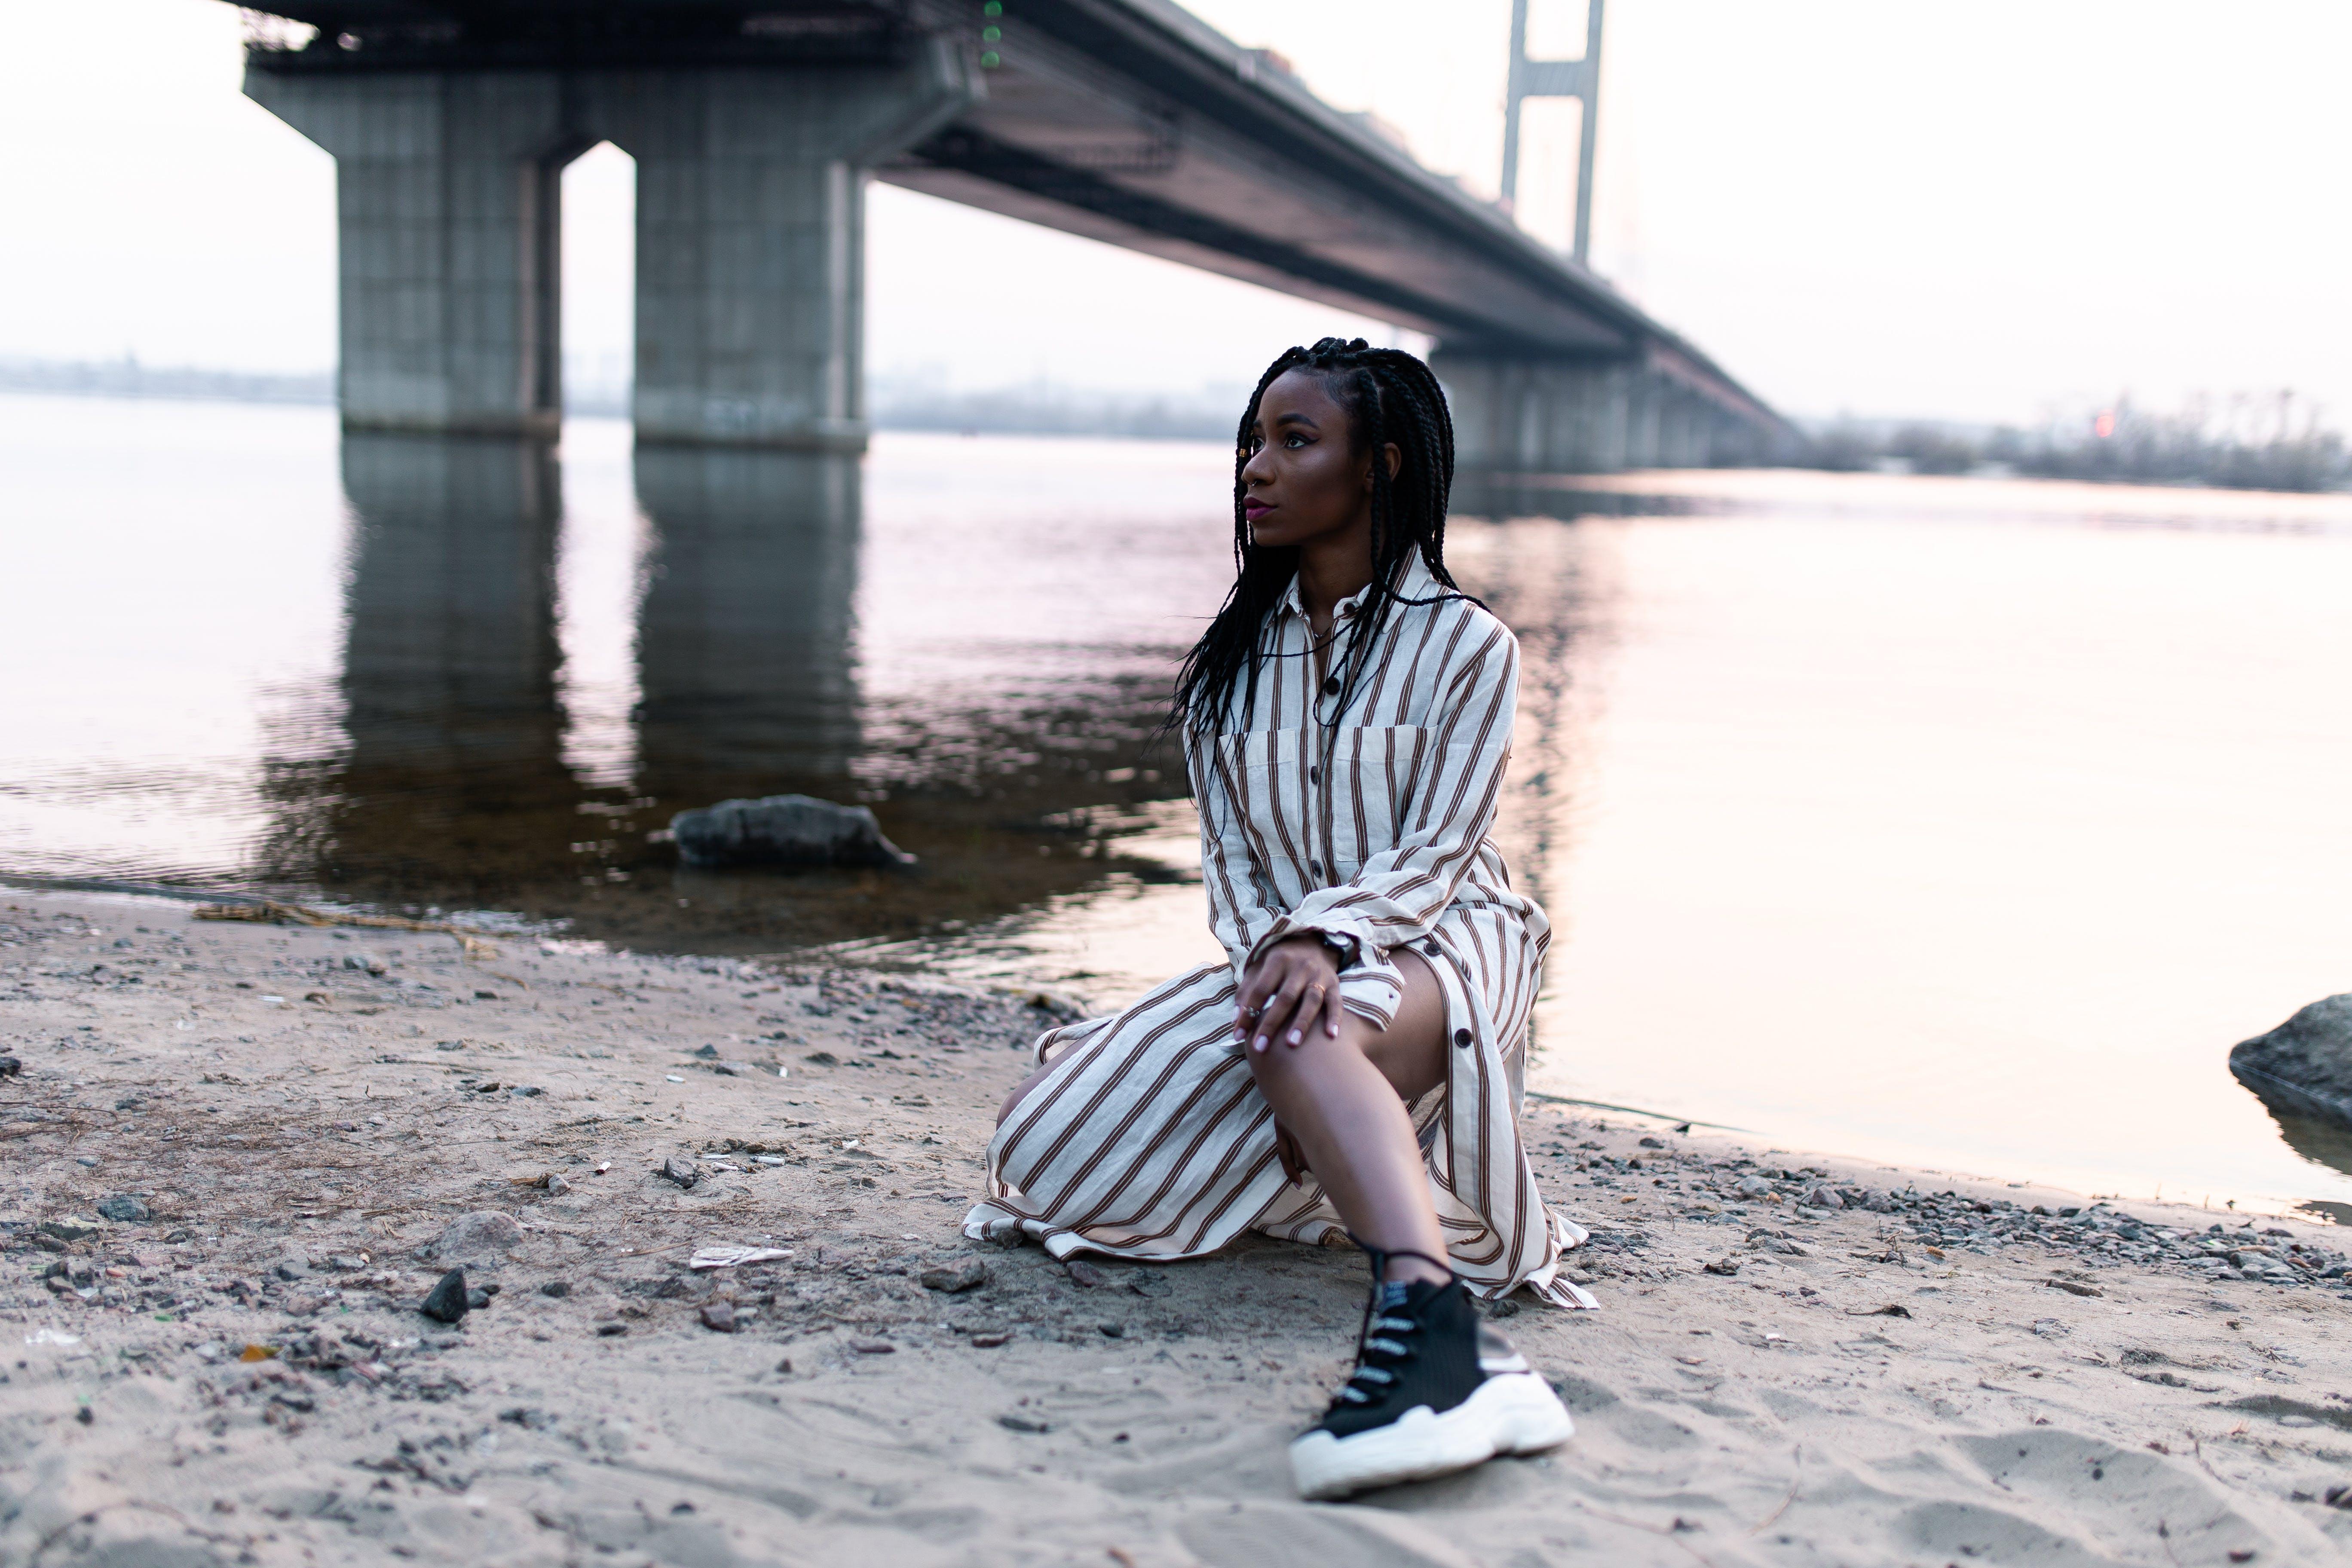 Woman Kneeling on Sand Near River and Bridge